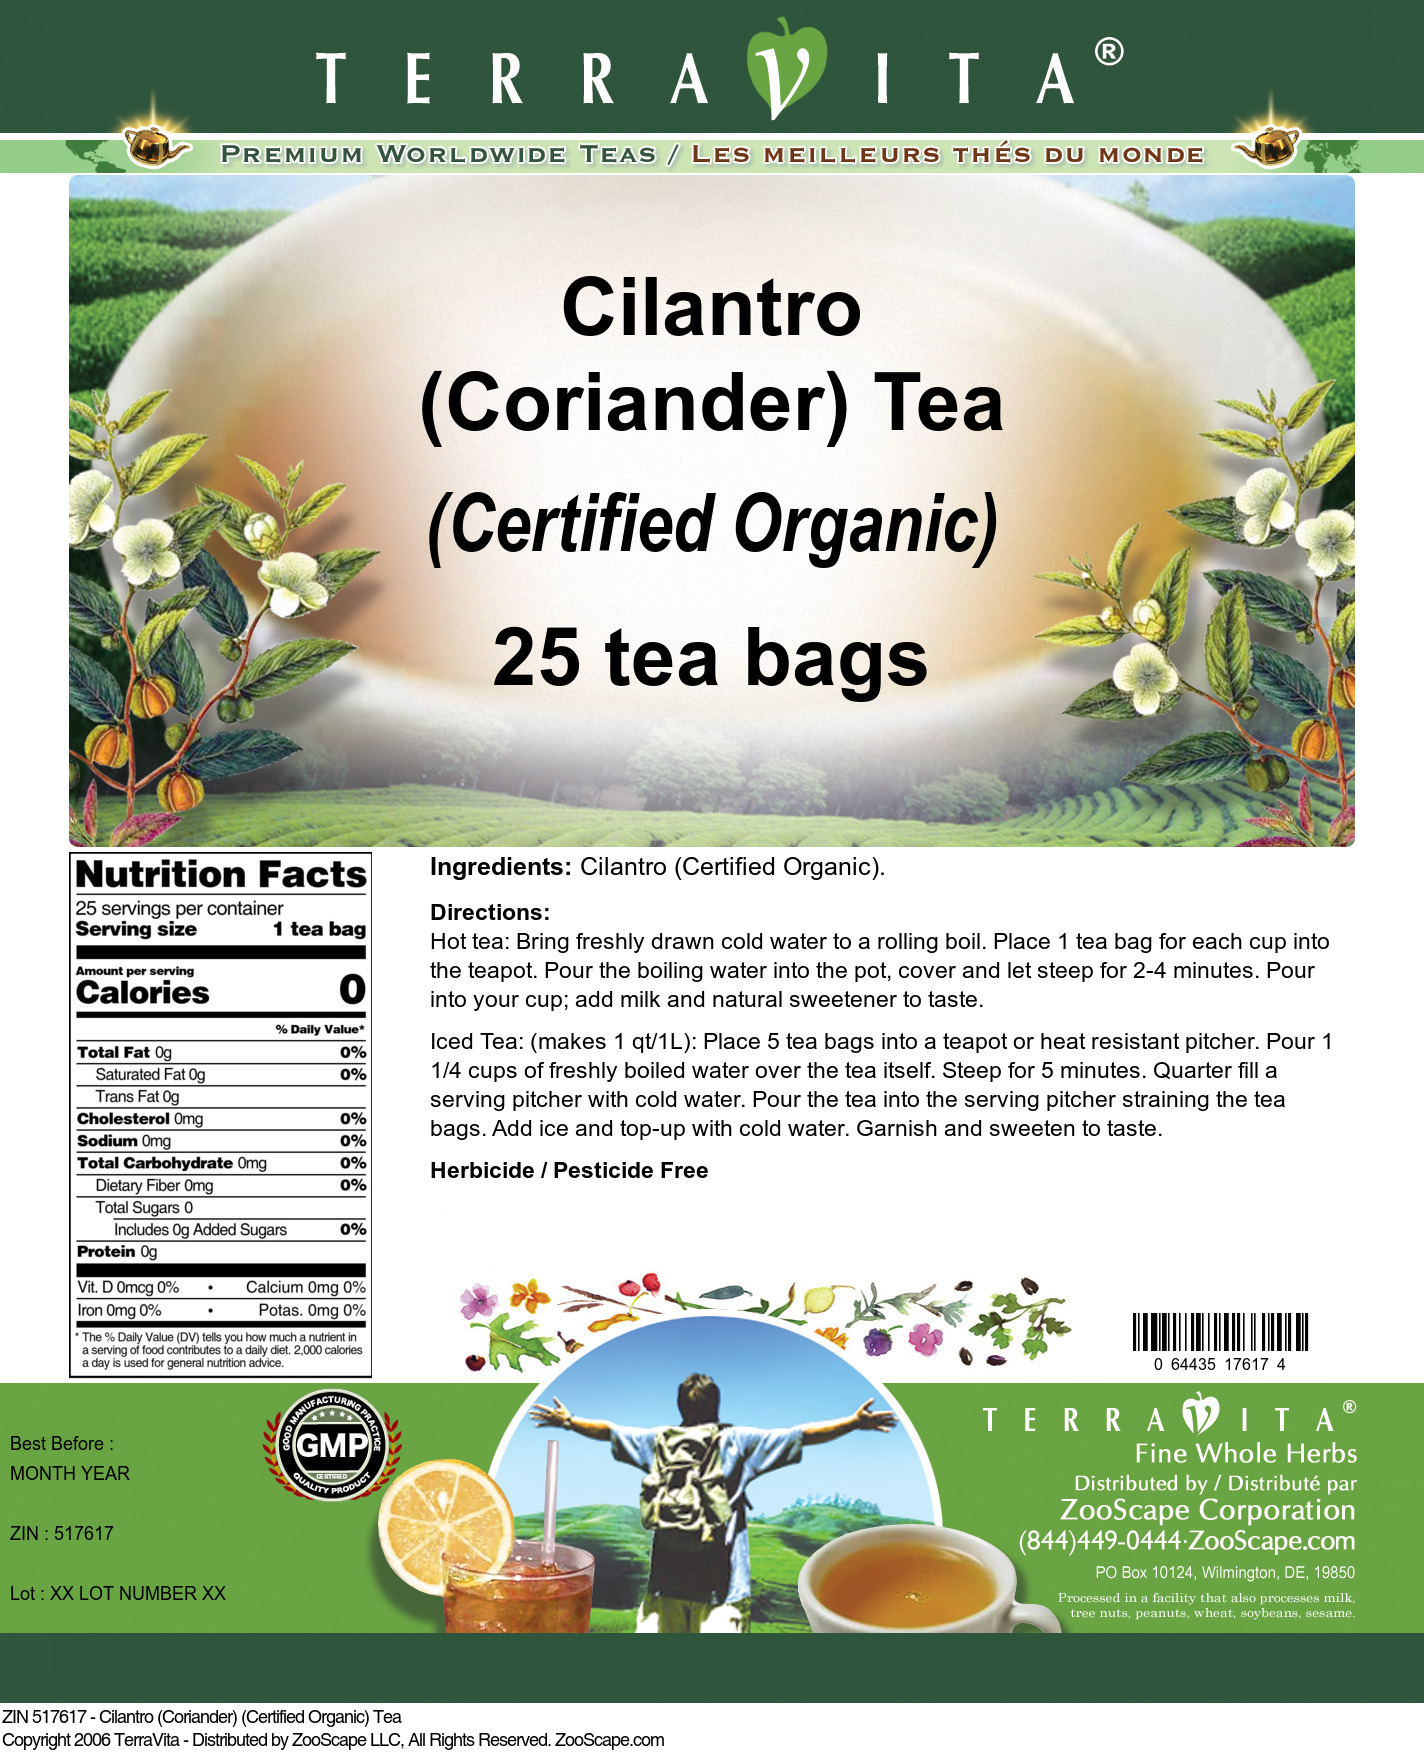 Cilantro (Coriander) (Certified Organic) Tea